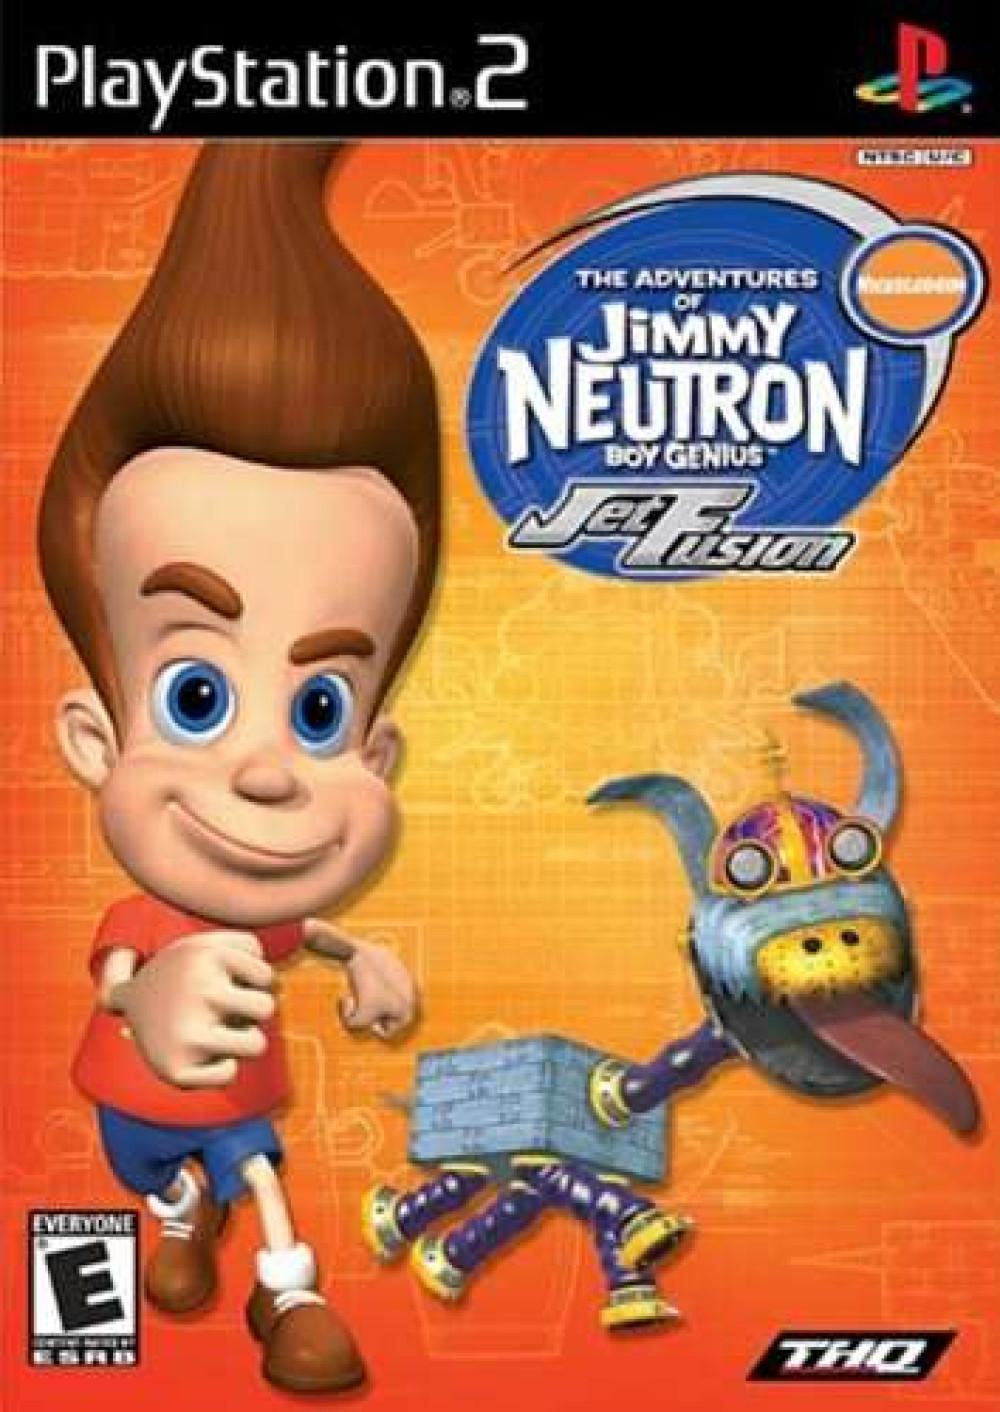 PS2 The Adventures of Jimmy Neutron Boy Genius Jet Fusion